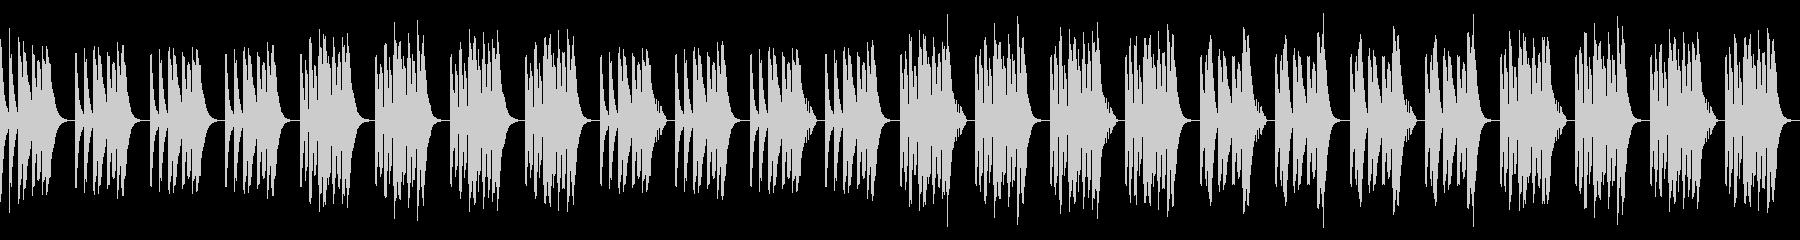 Everyday / Loose / Comical Recorder's unreproduced waveform